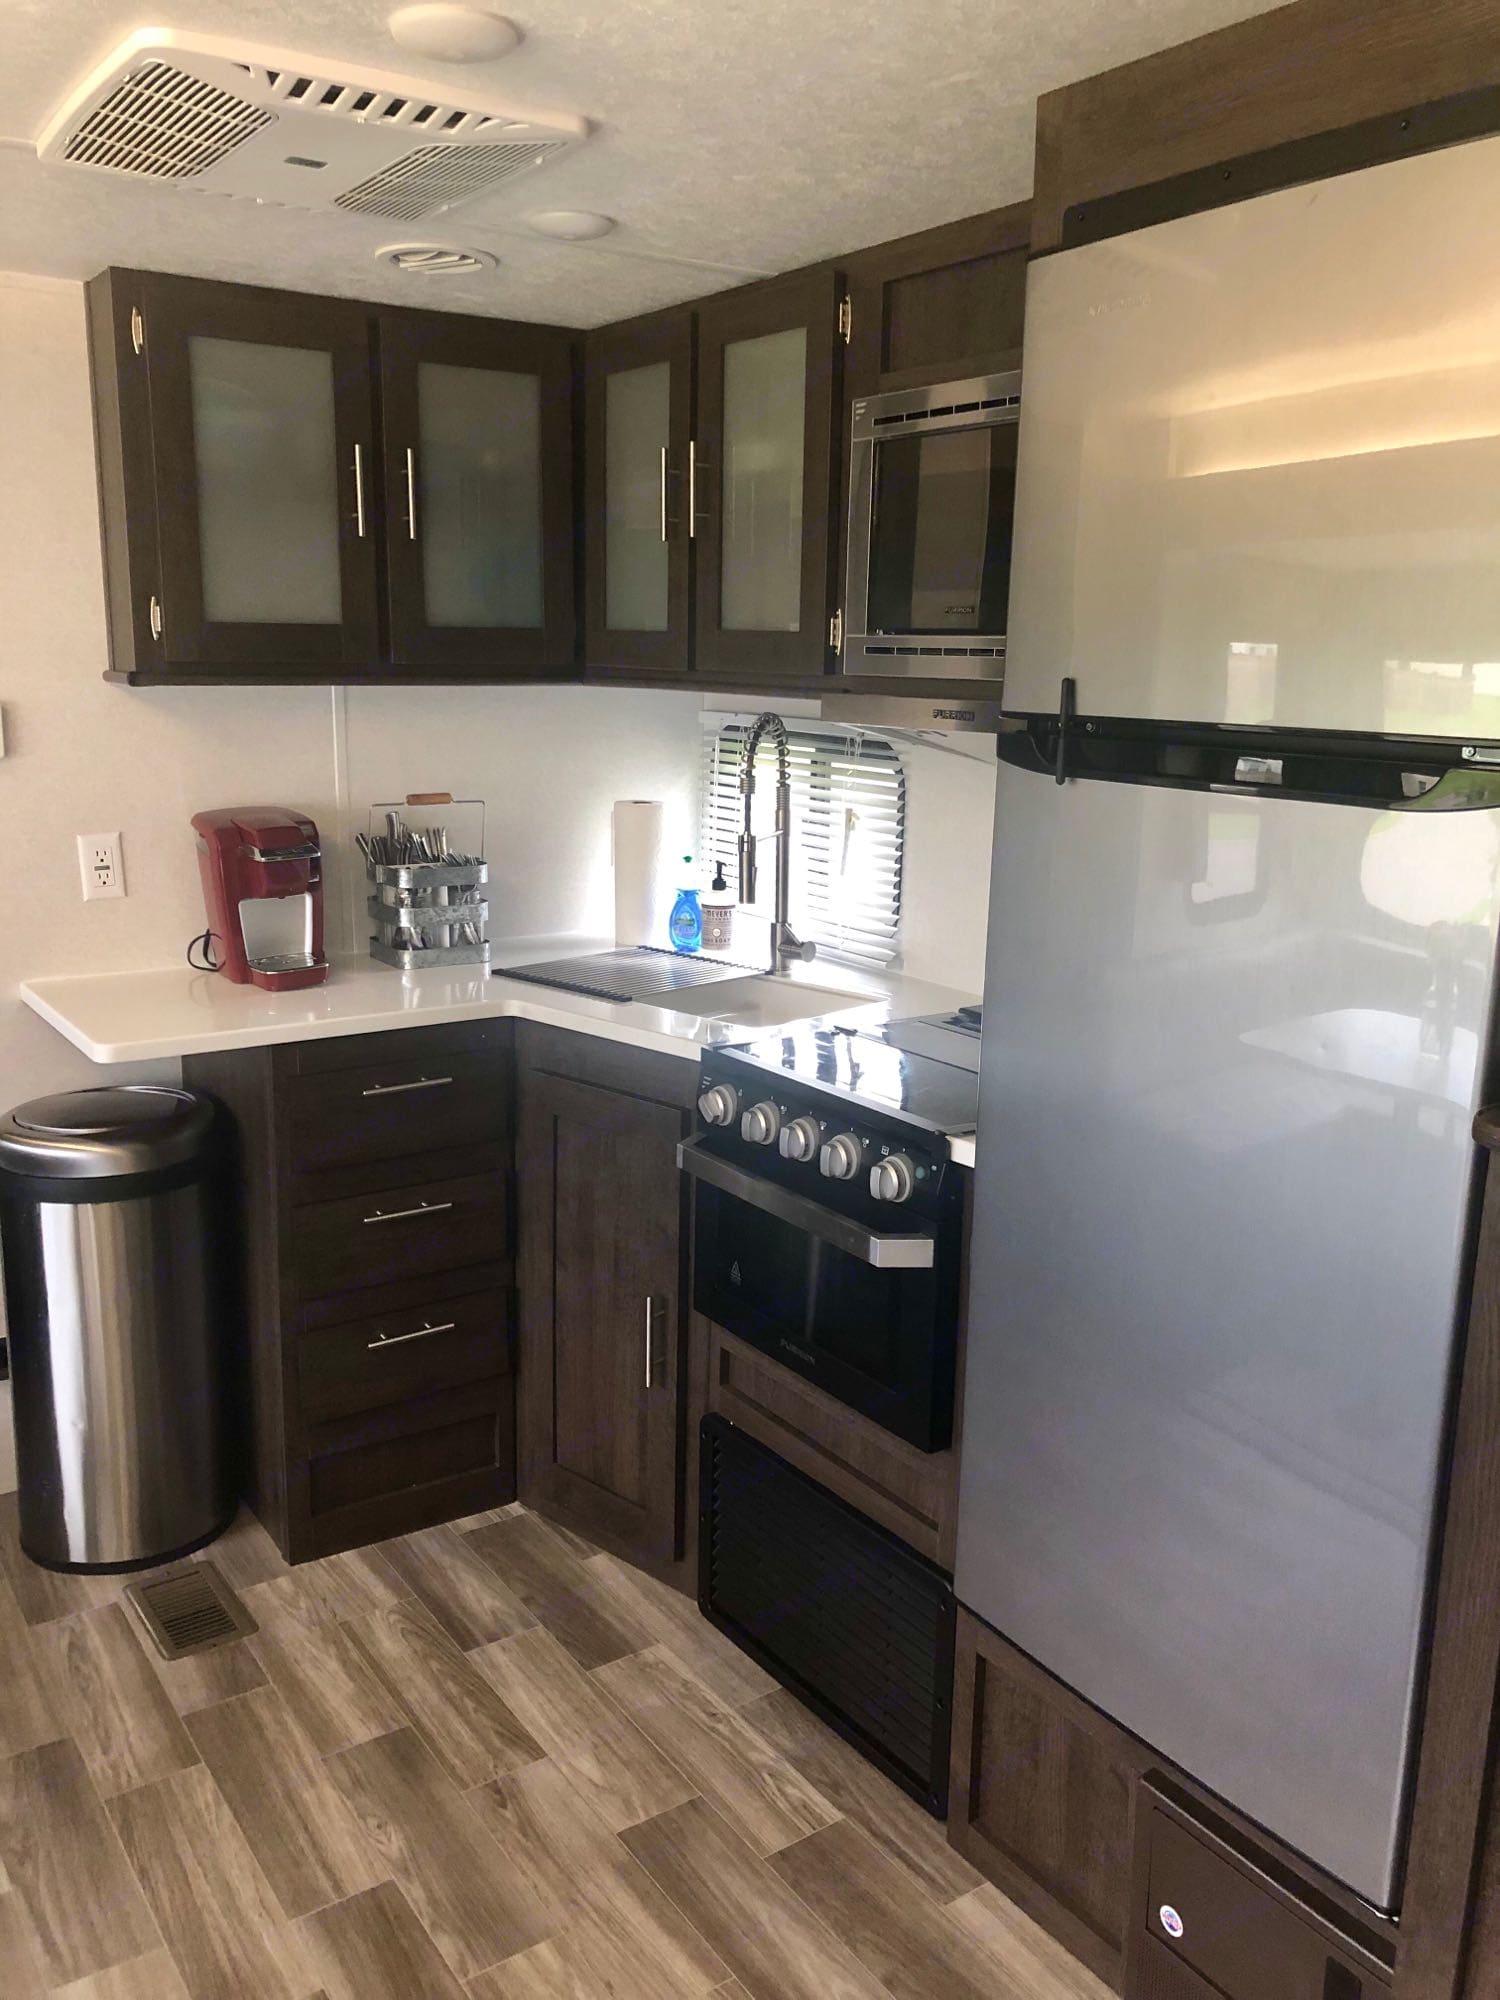 Kitchen (microwave, stove, oven, spacious fridge & freezer, single-cup Keurig coffee maker). Forest River Salem 2020